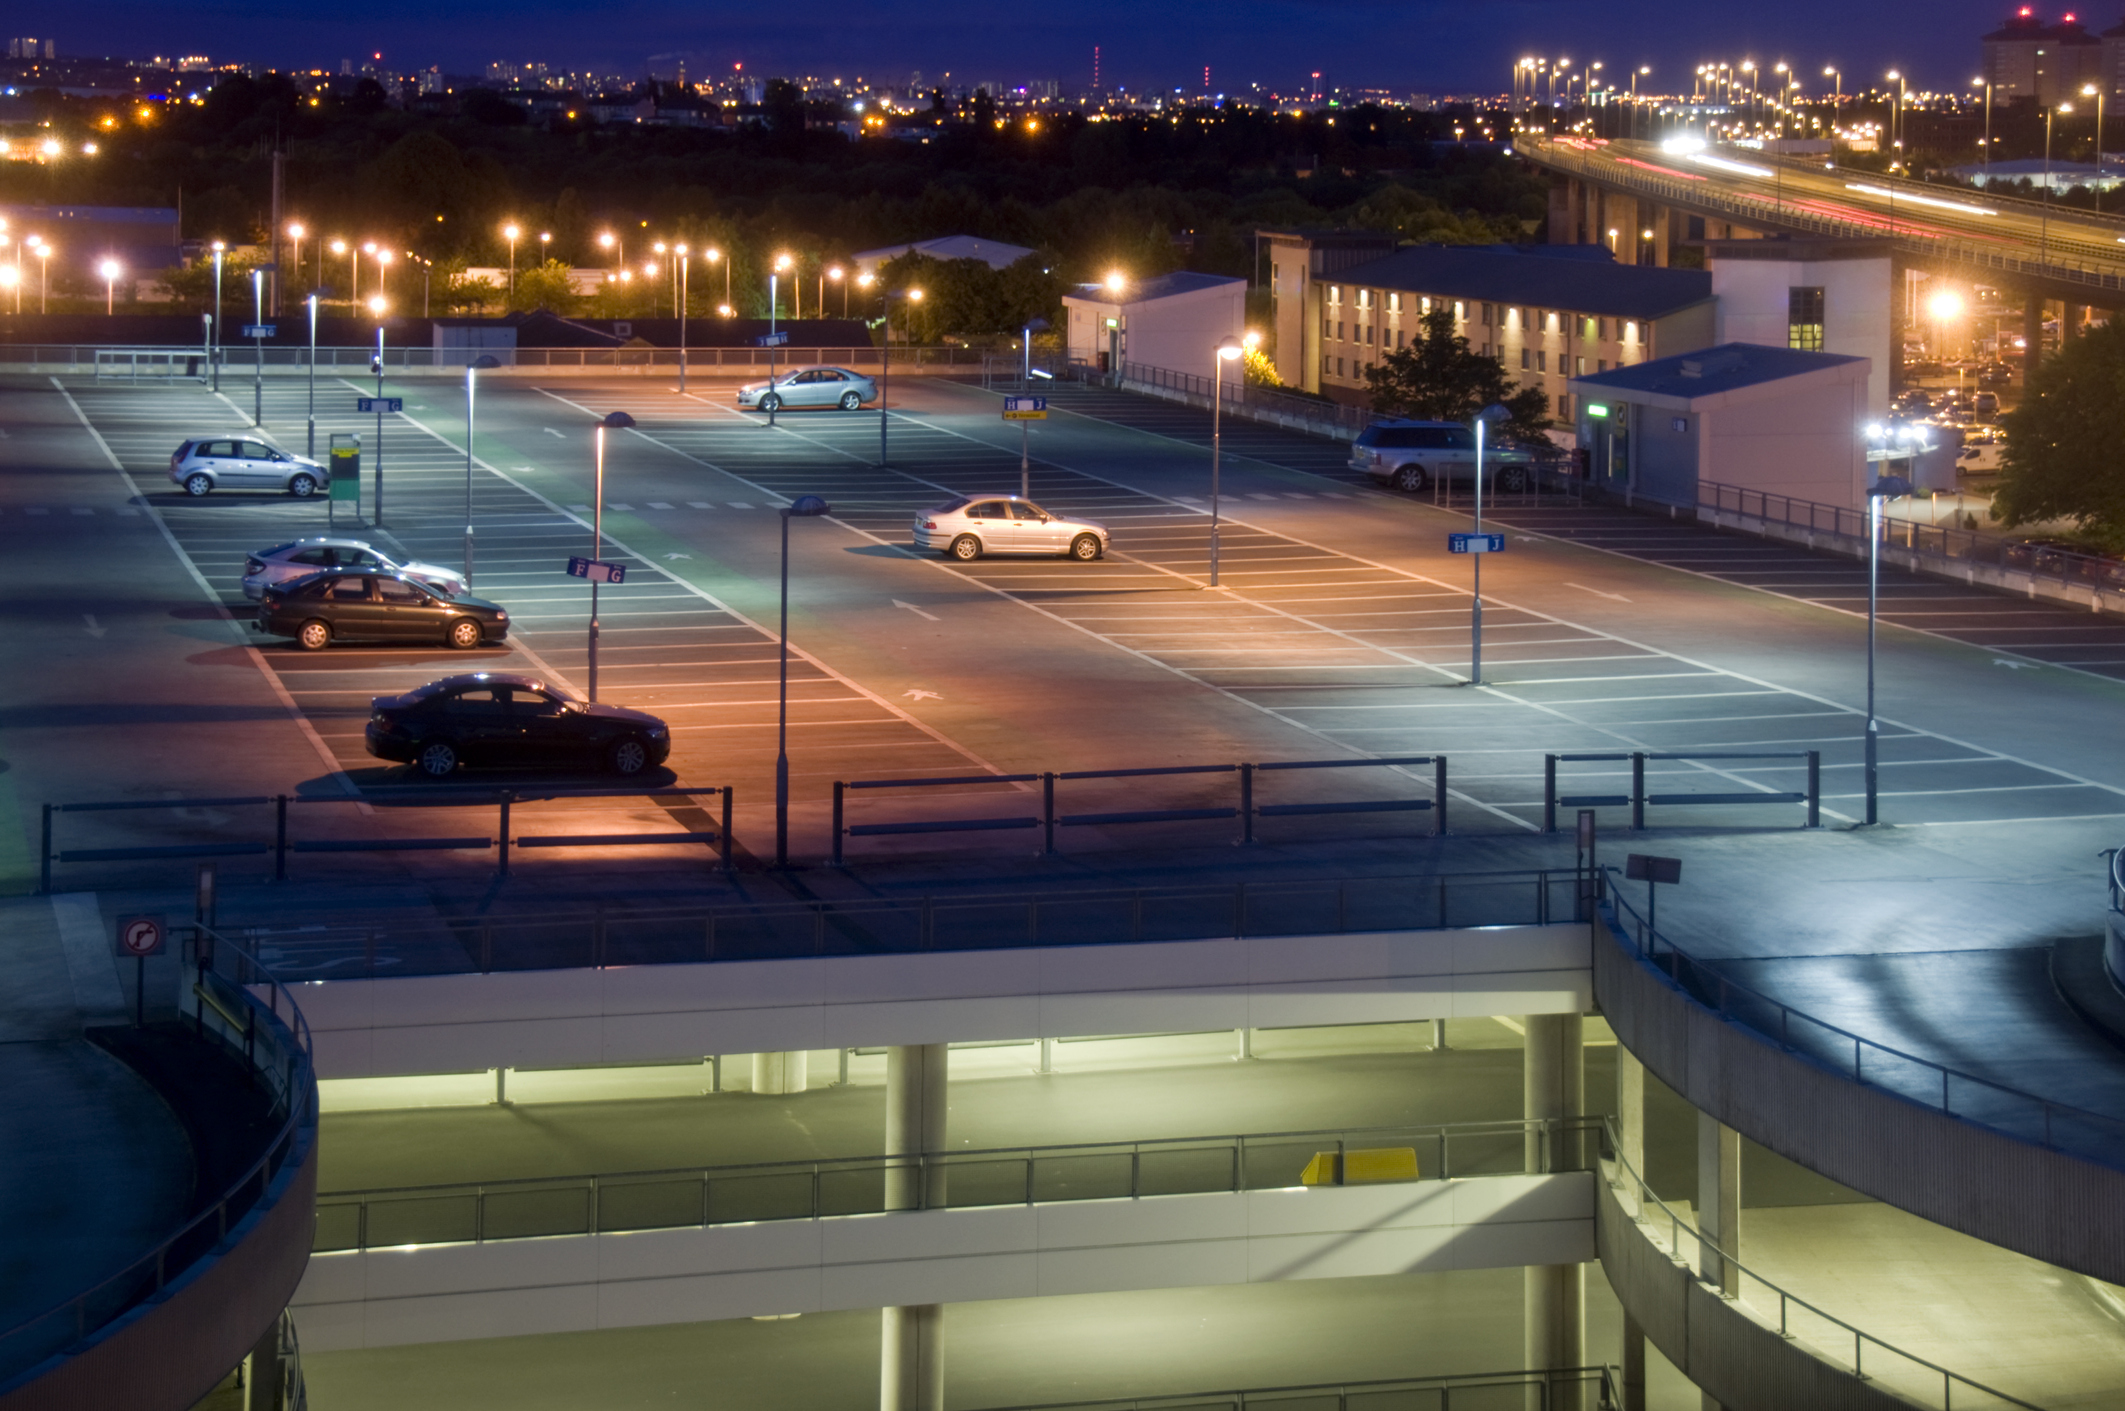 Parking Lot Lighting at night